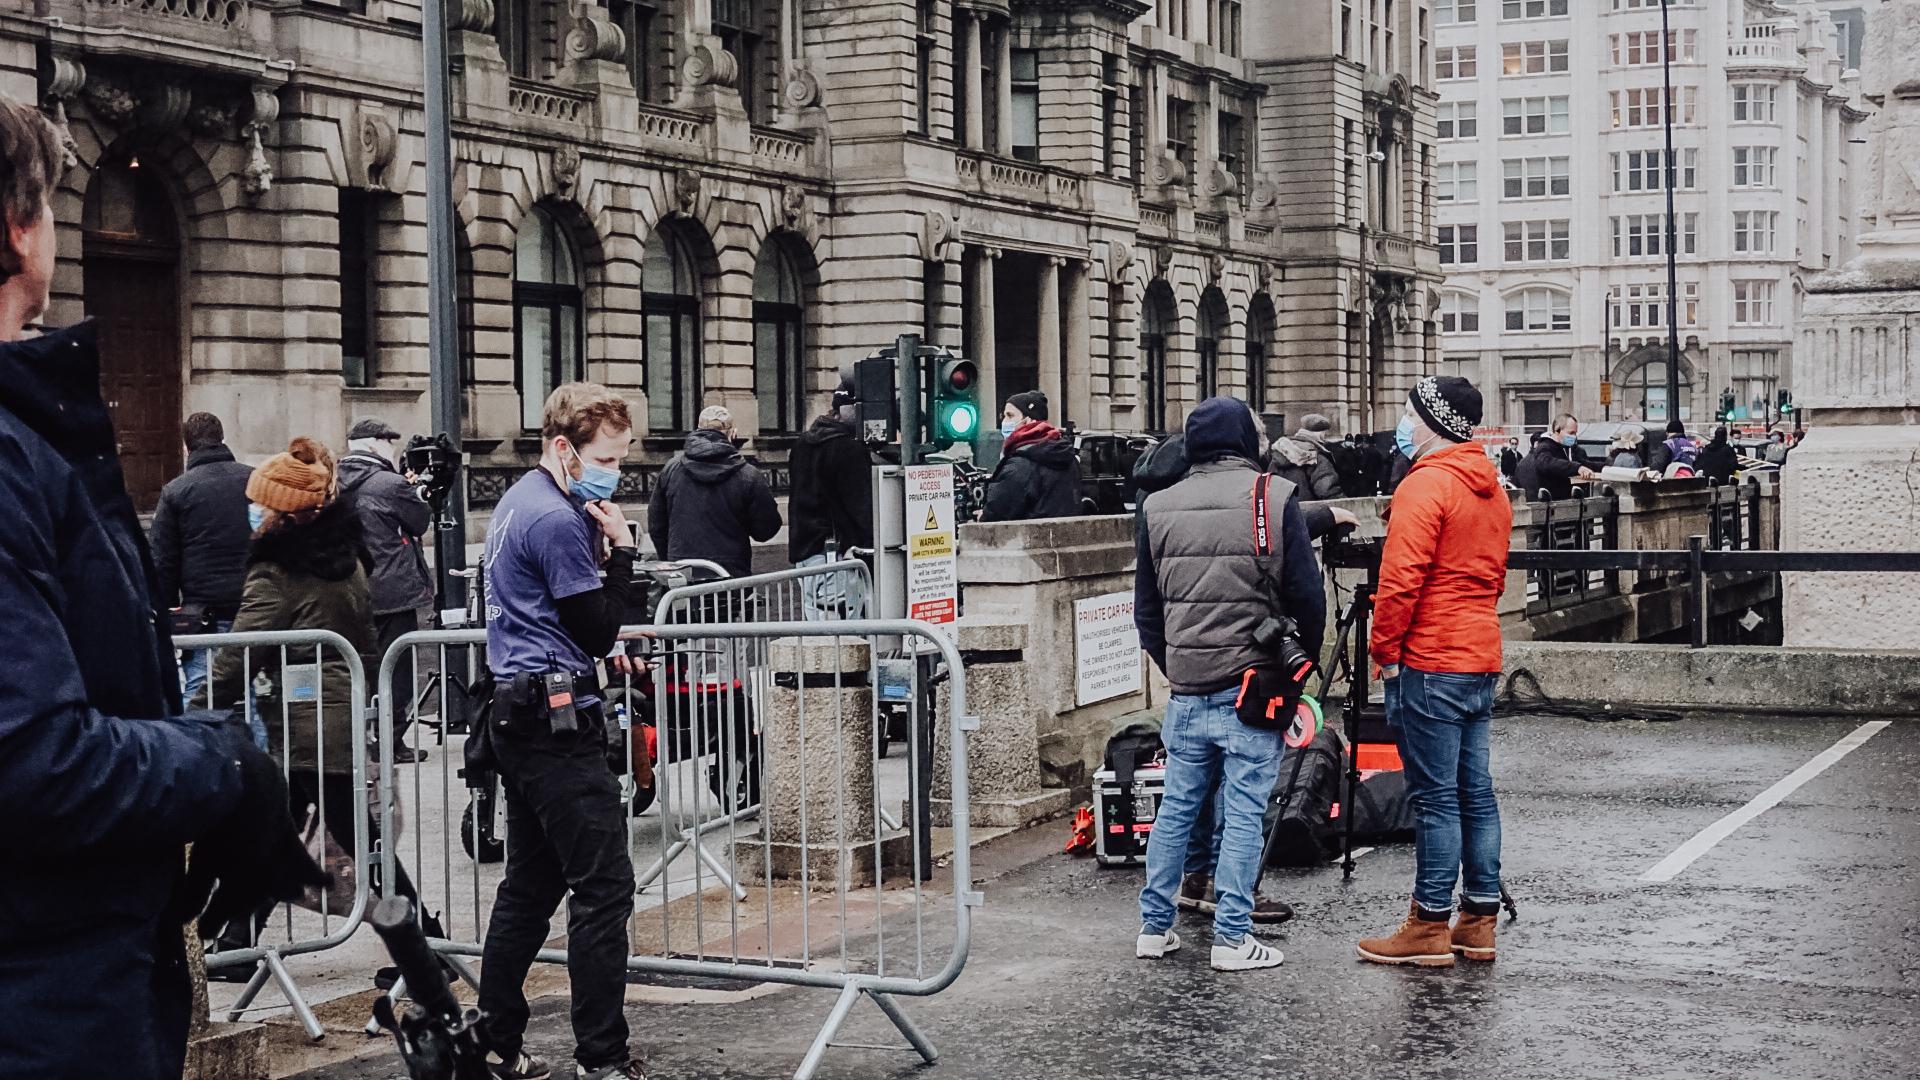 Netflix Munich On Set photos